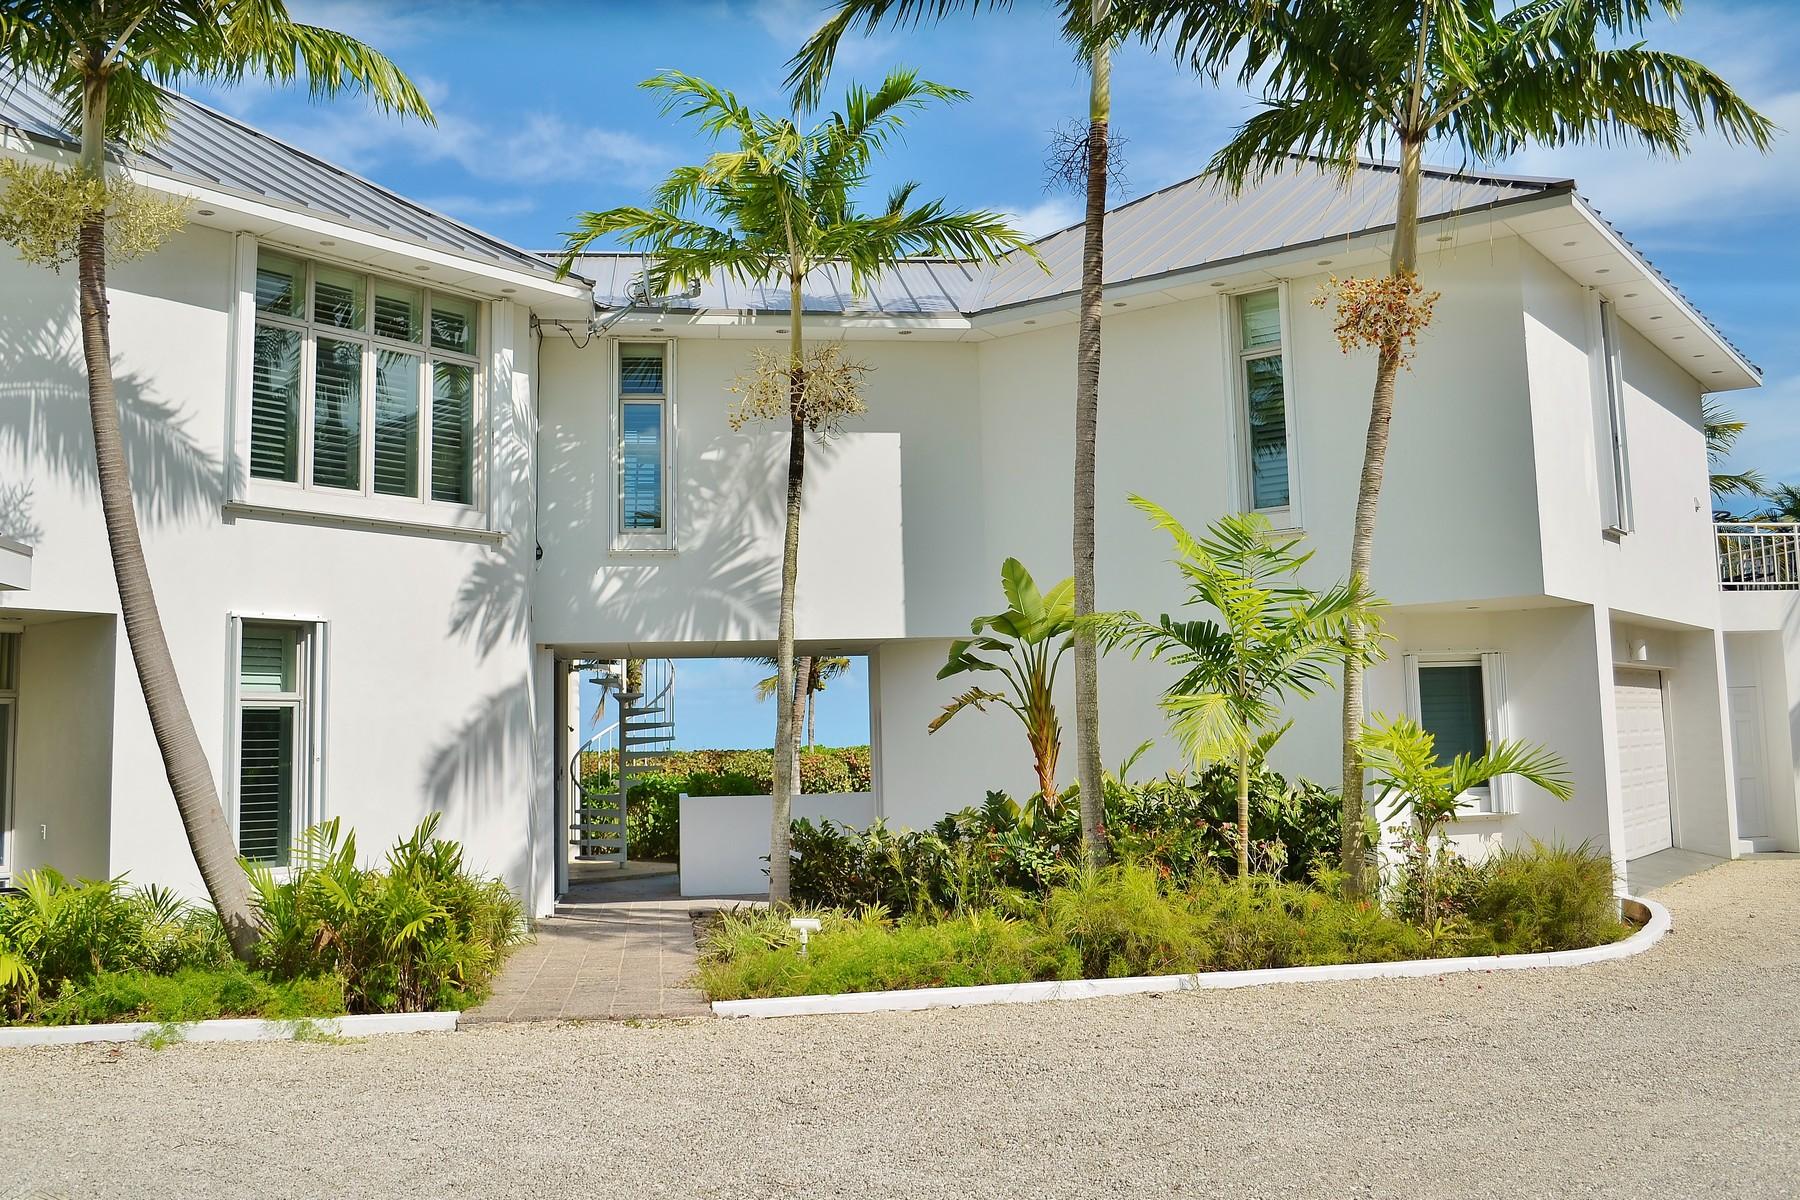 Additional photo for property listing at Serenity House Treasure Cay, Abaco Bahamas